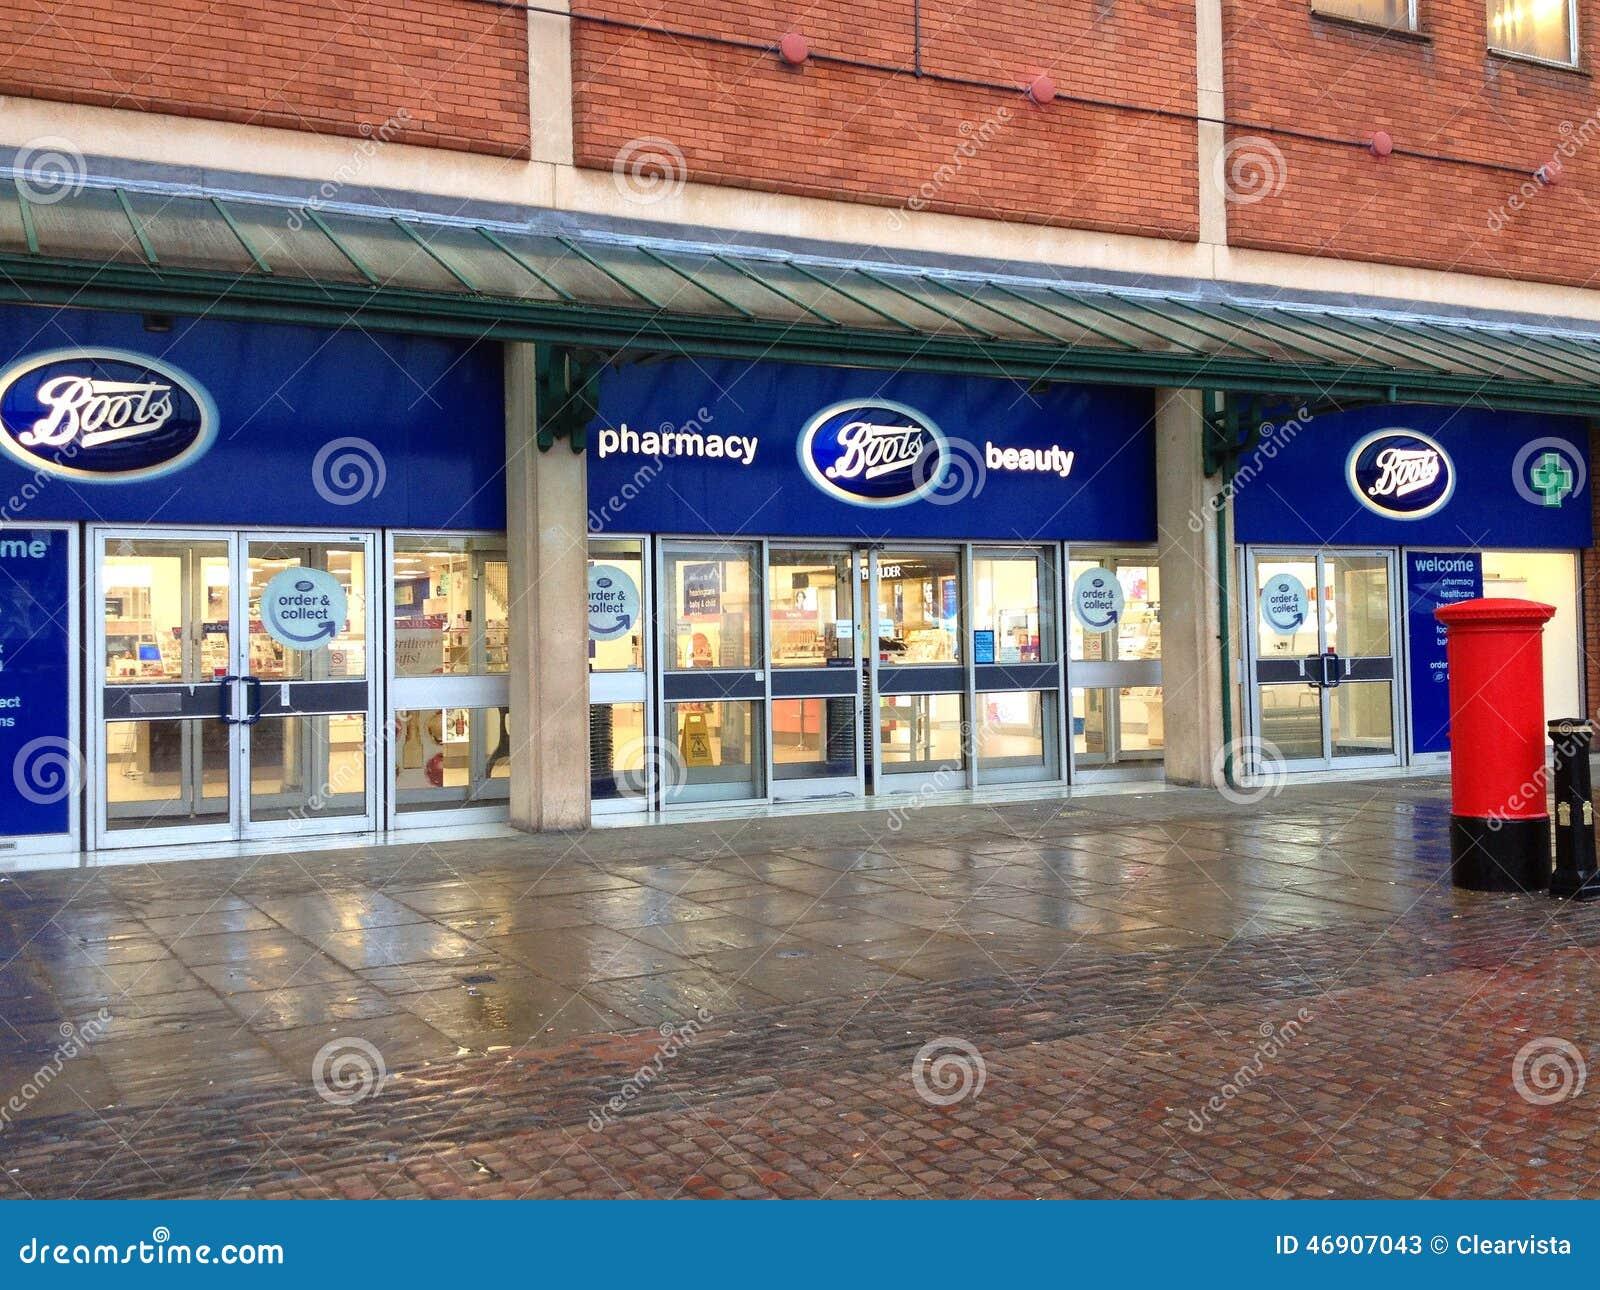 Boots chemist uk online shopping